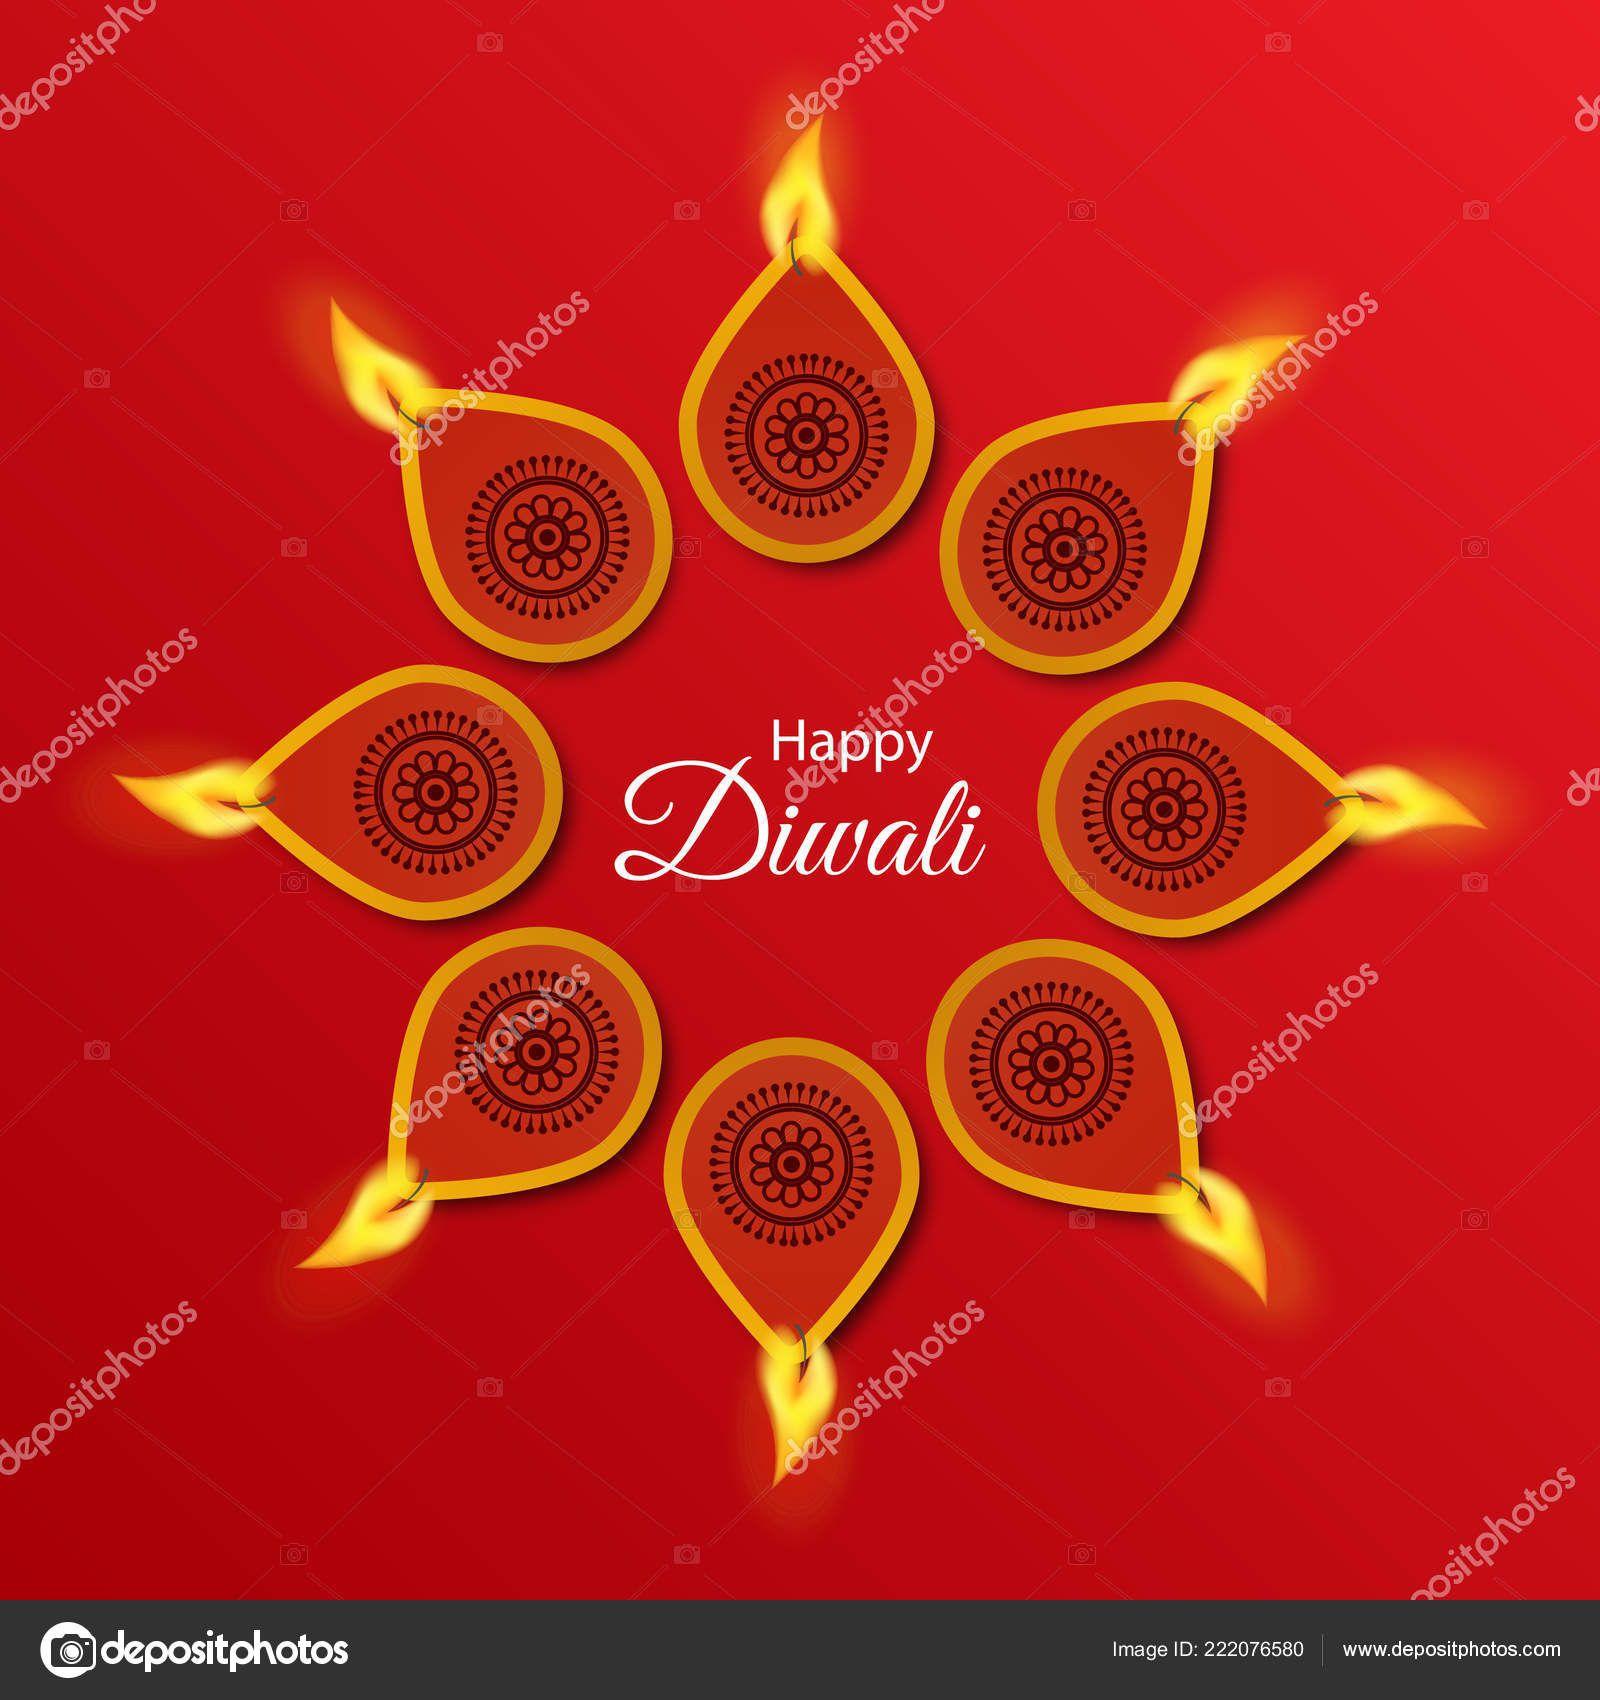 003 Phenomenal Diwali Party Invite Template Free Photo Full